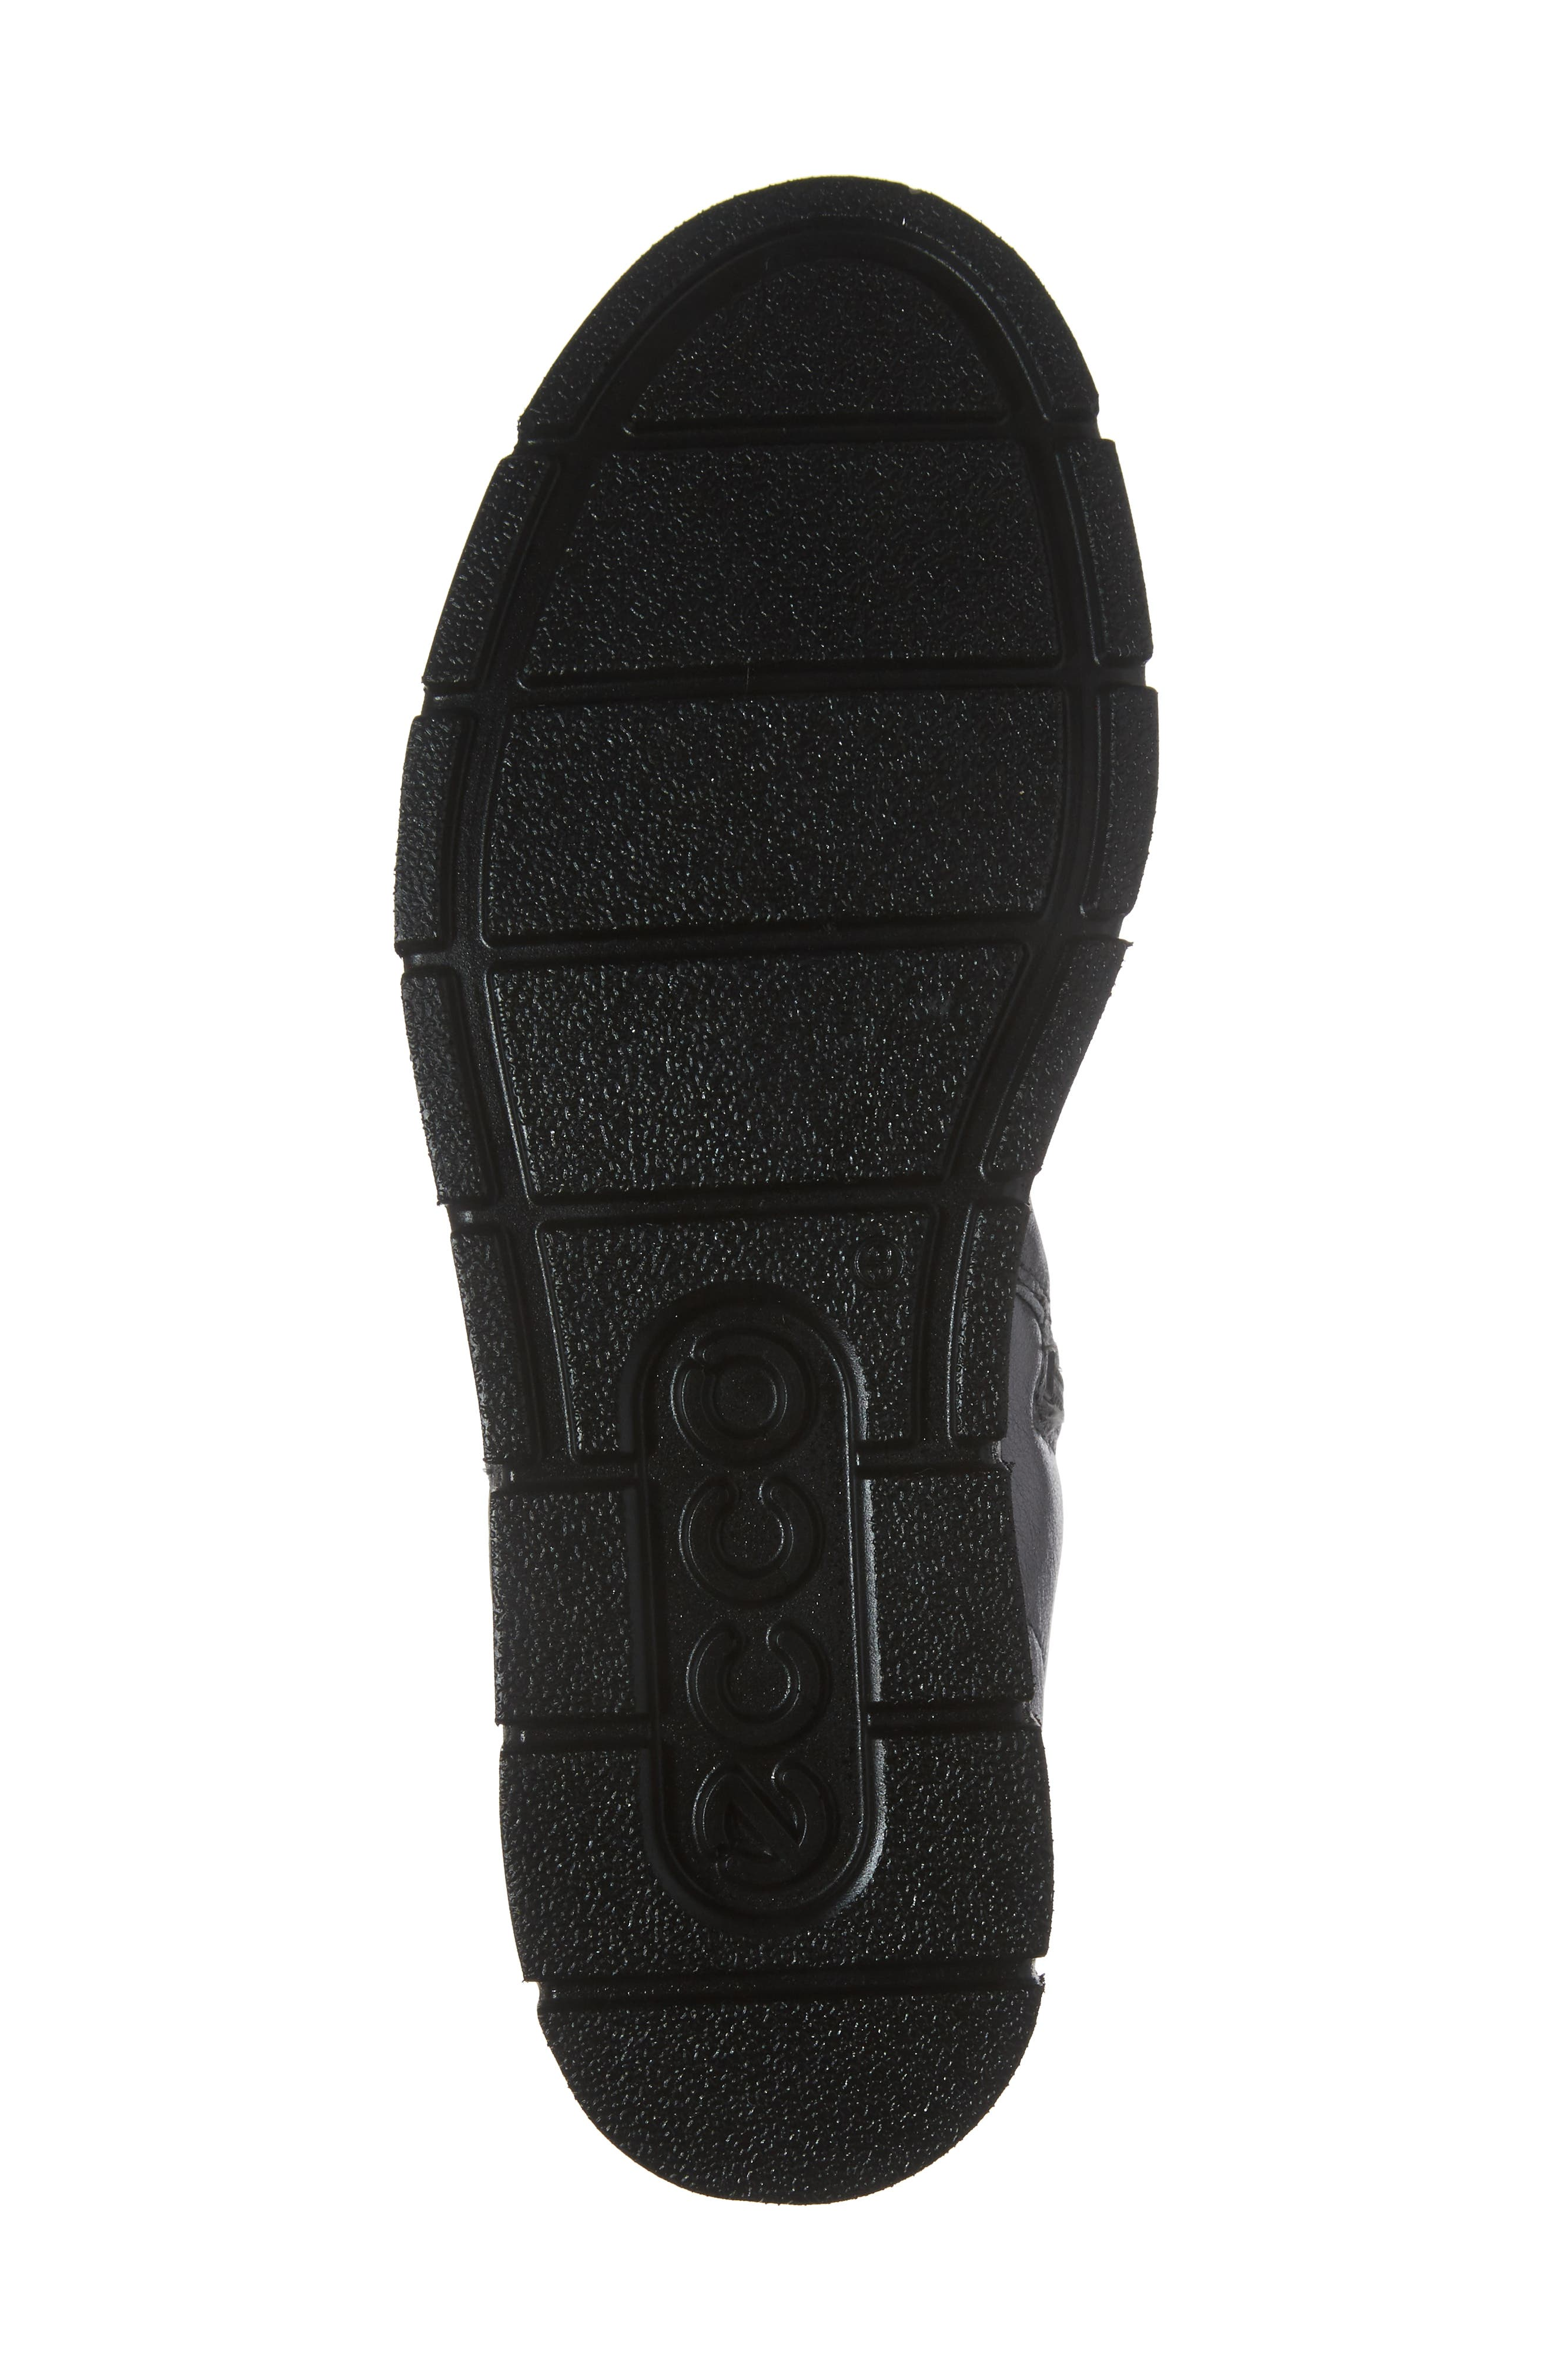 'Bella' Zip Bootie,                             Alternate thumbnail 6, color,                             Dark Shadow Leather